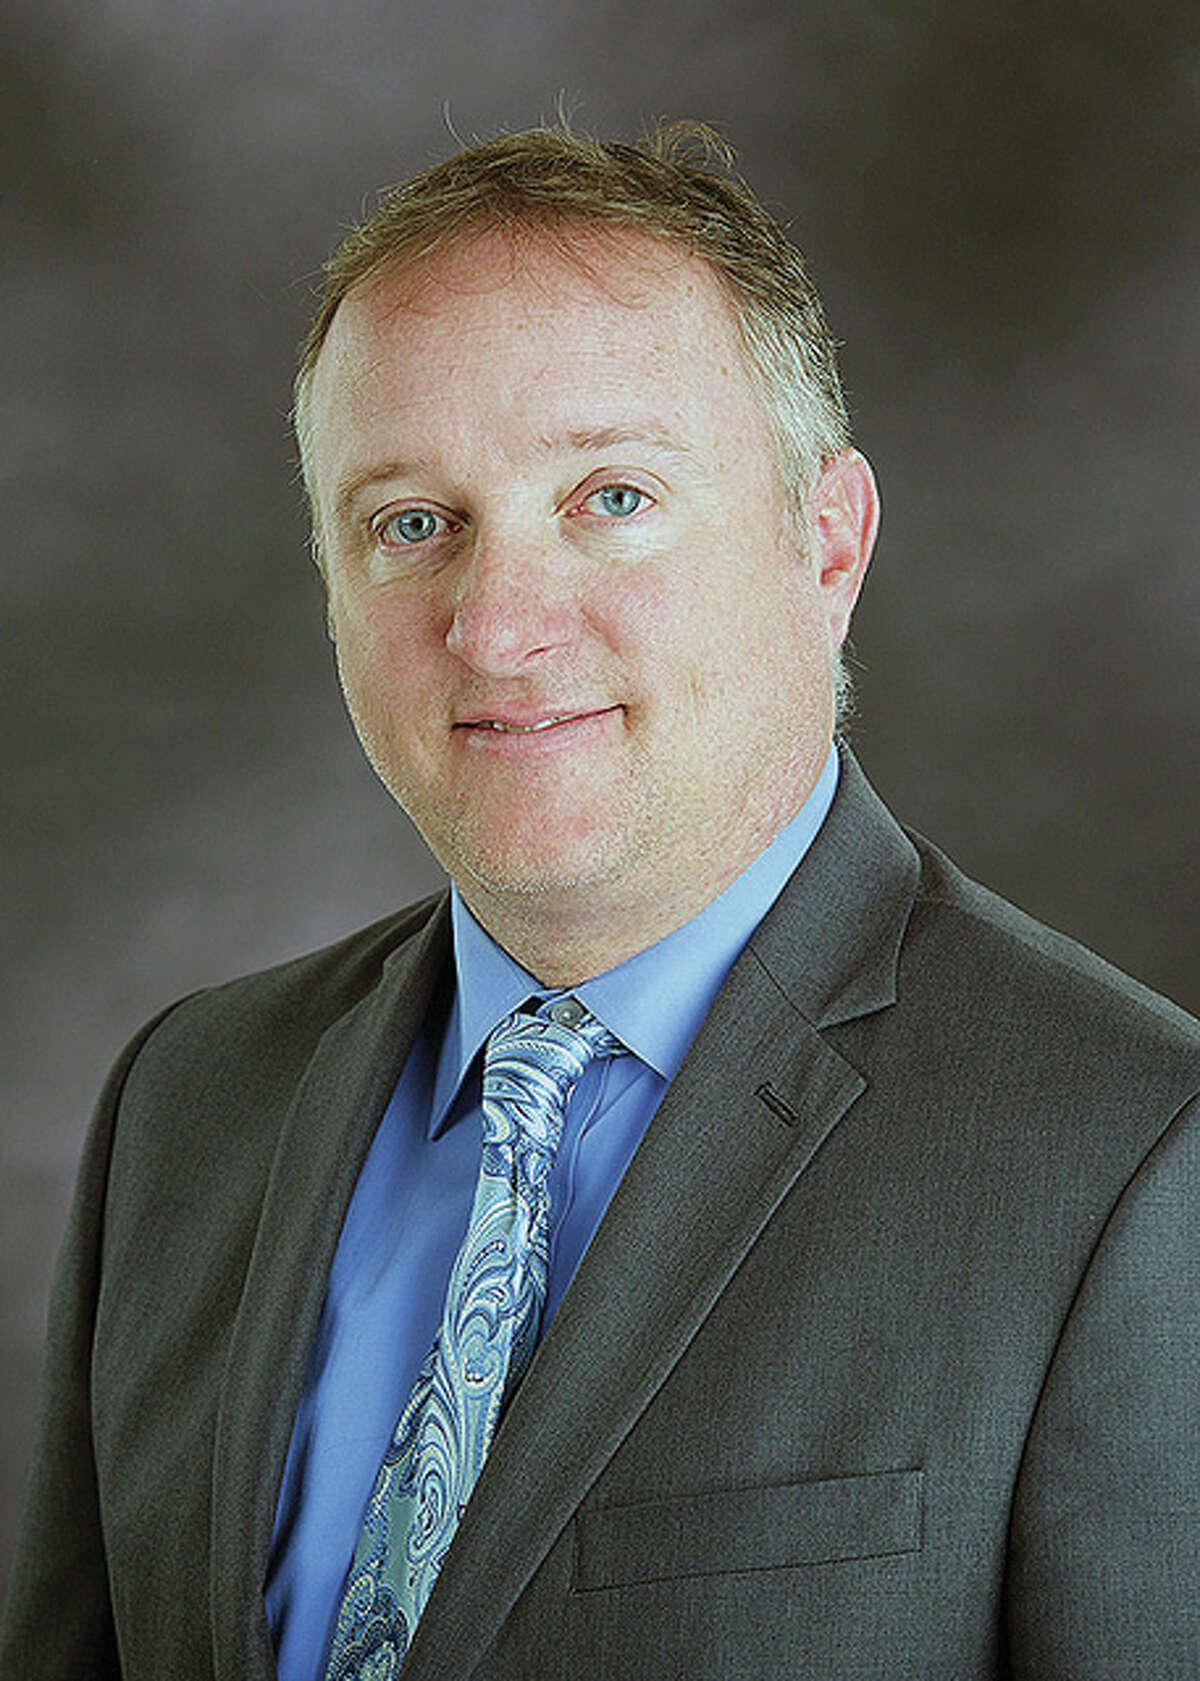 Michael Langdon